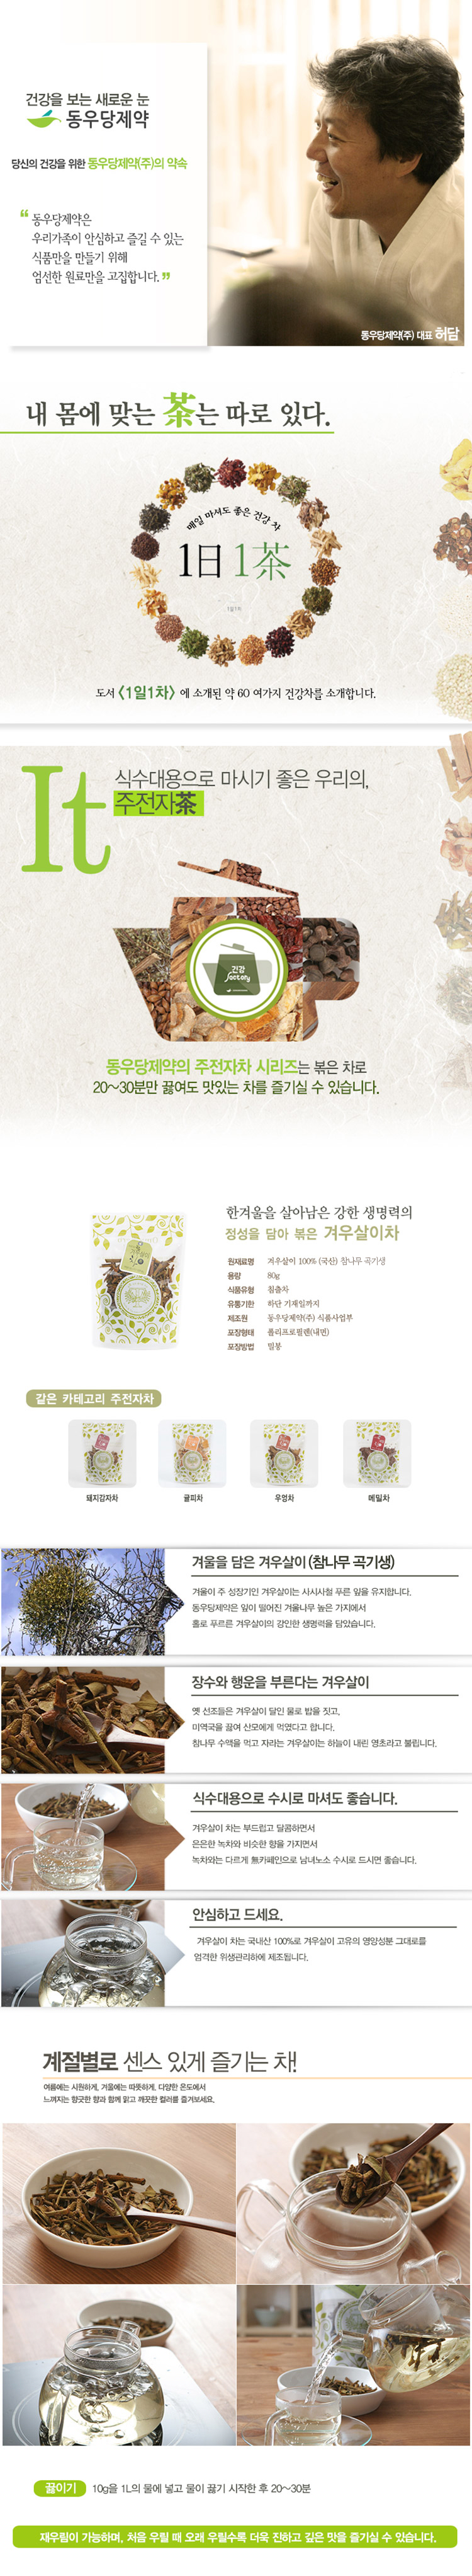 [ DongWuDangMedicine ] [D3][OmniHerb]Roasted Mistletoe  Tea 80g